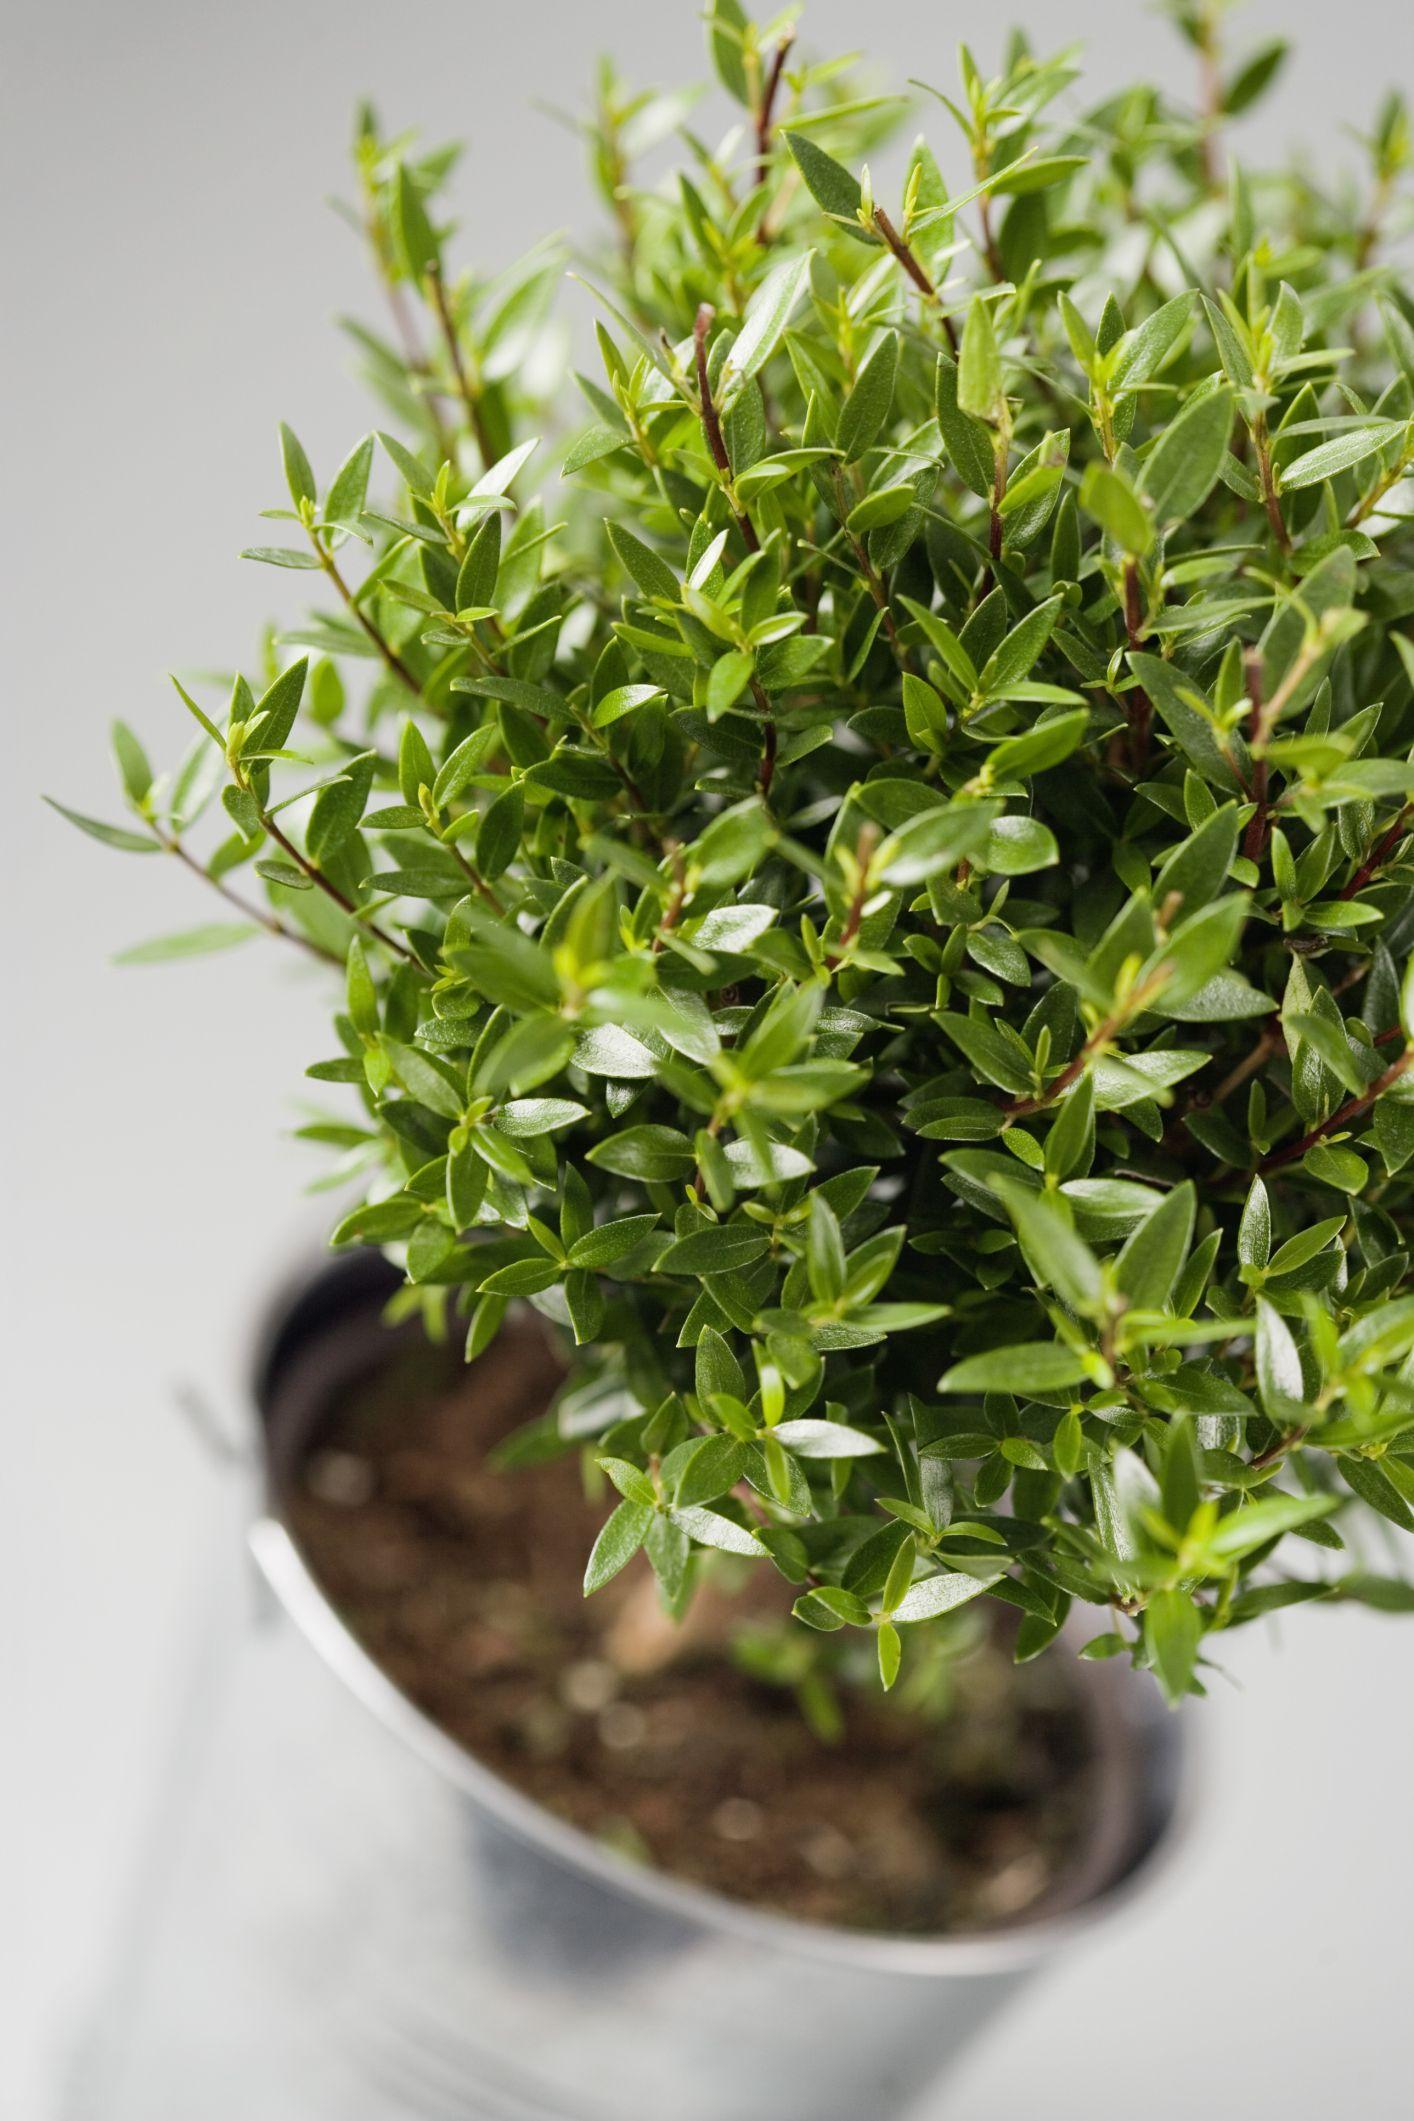 How To Get Rid Of Little Black Flies In Plant Soil Ehow Com In 2020 Fruit Flies Fruit Flies In House Plants